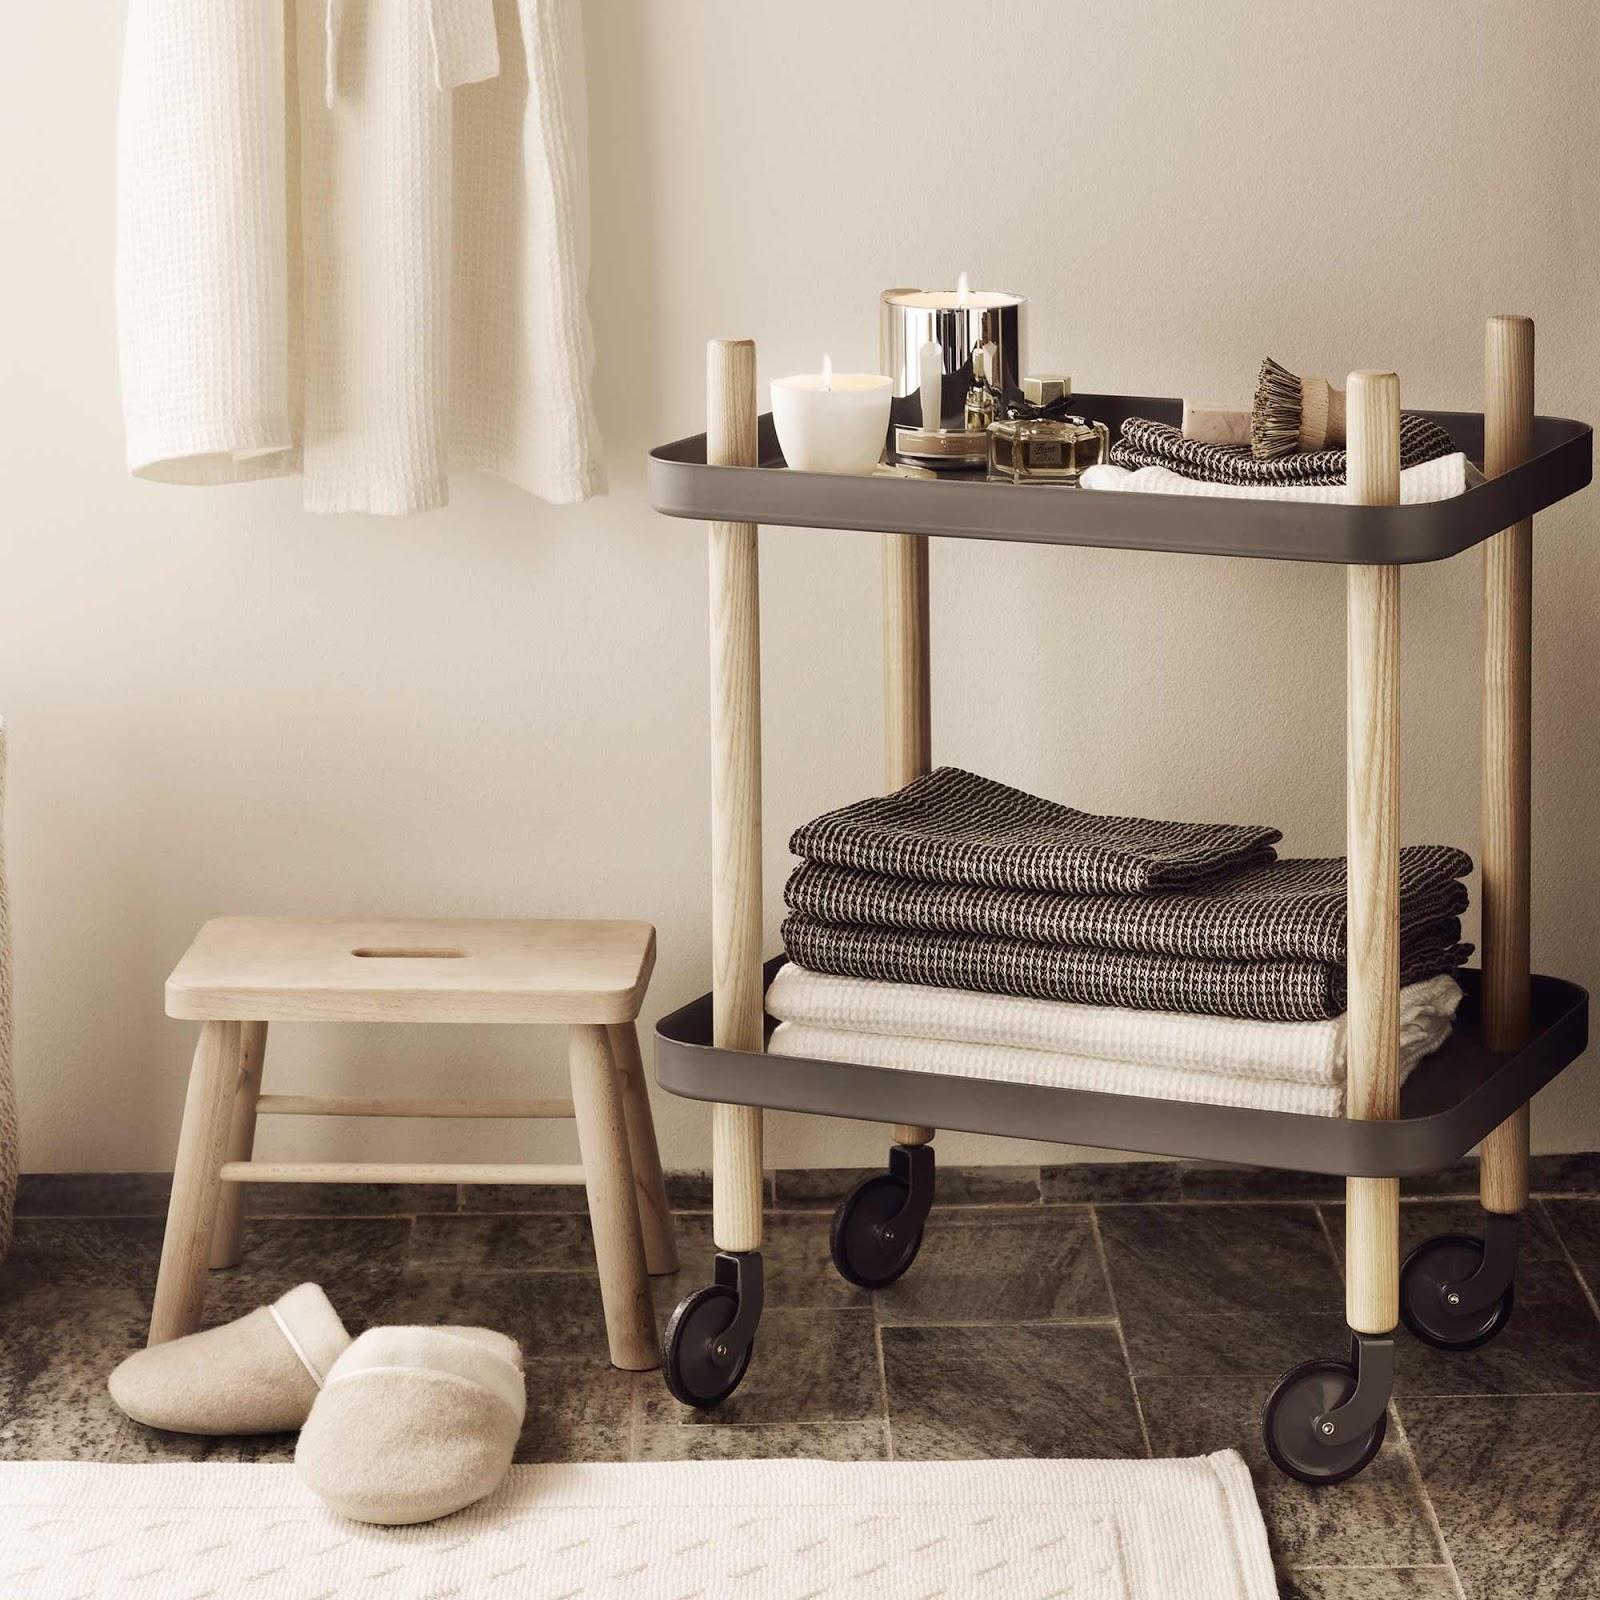 URBANARA kotra towel set